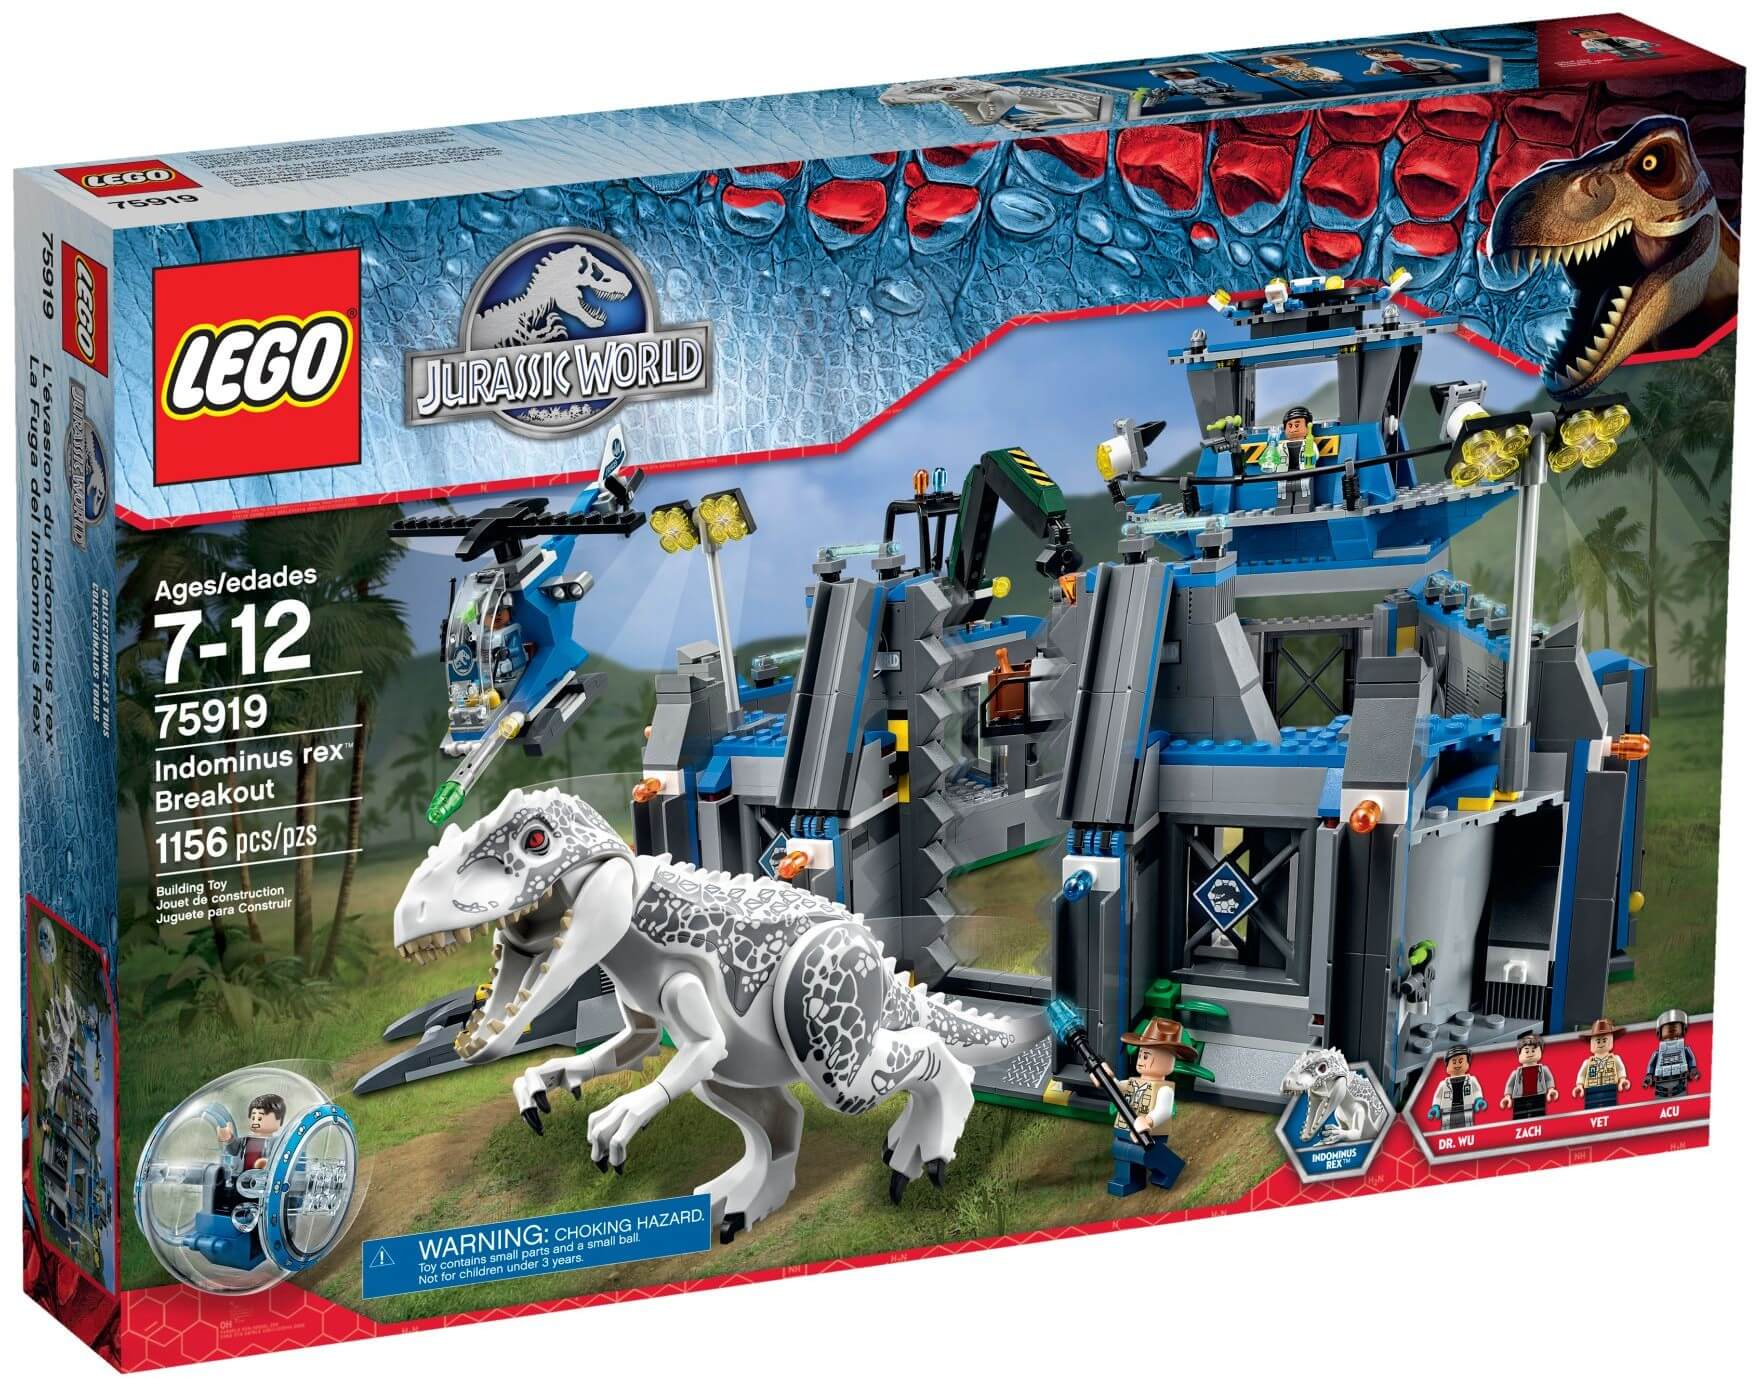 Mua đồ chơi LEGO 75919 - LEGO Jurassic World 75919 - Indominus Rex xổng chuồng (LEGO Jurassic World Indominous Rex Breakout 75919)